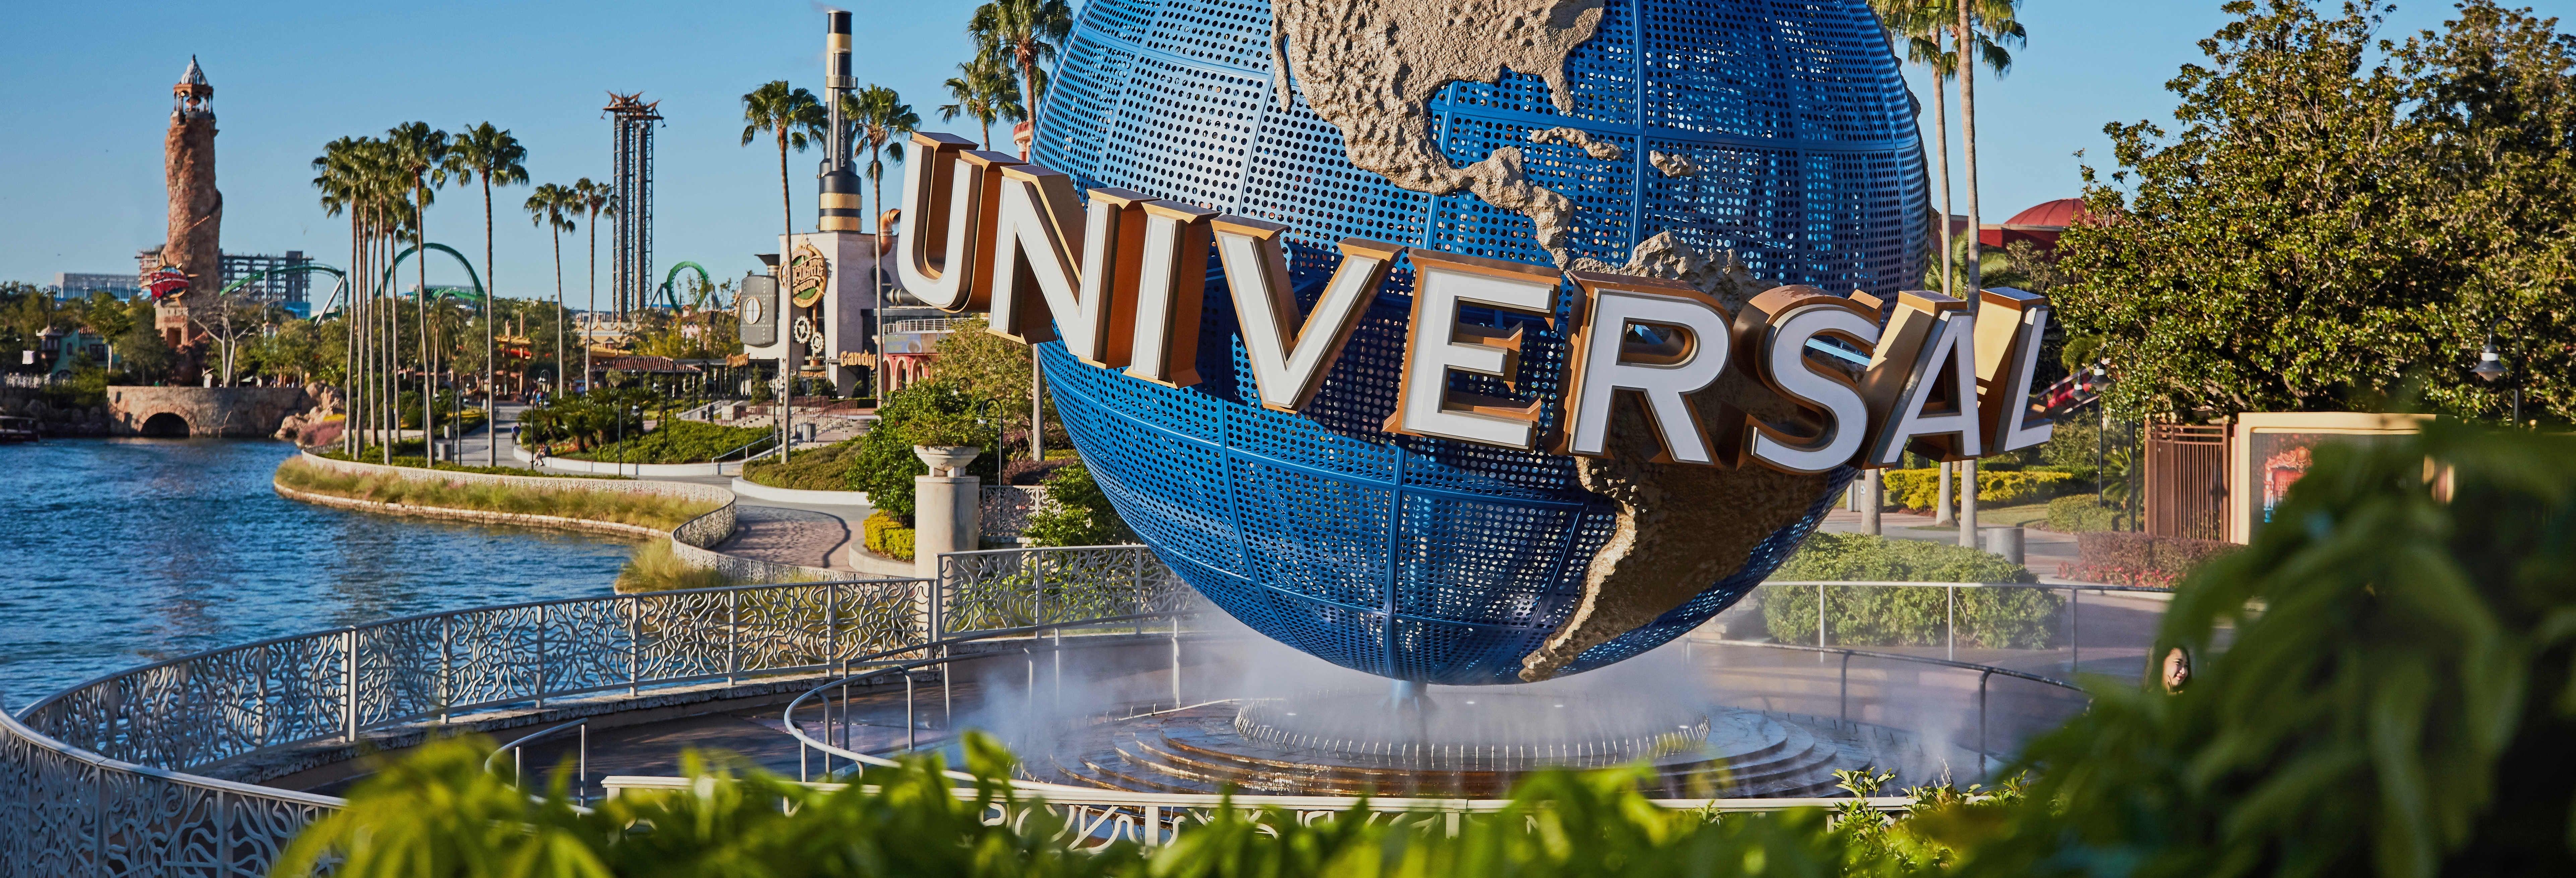 Orlando Theme Parks Trip